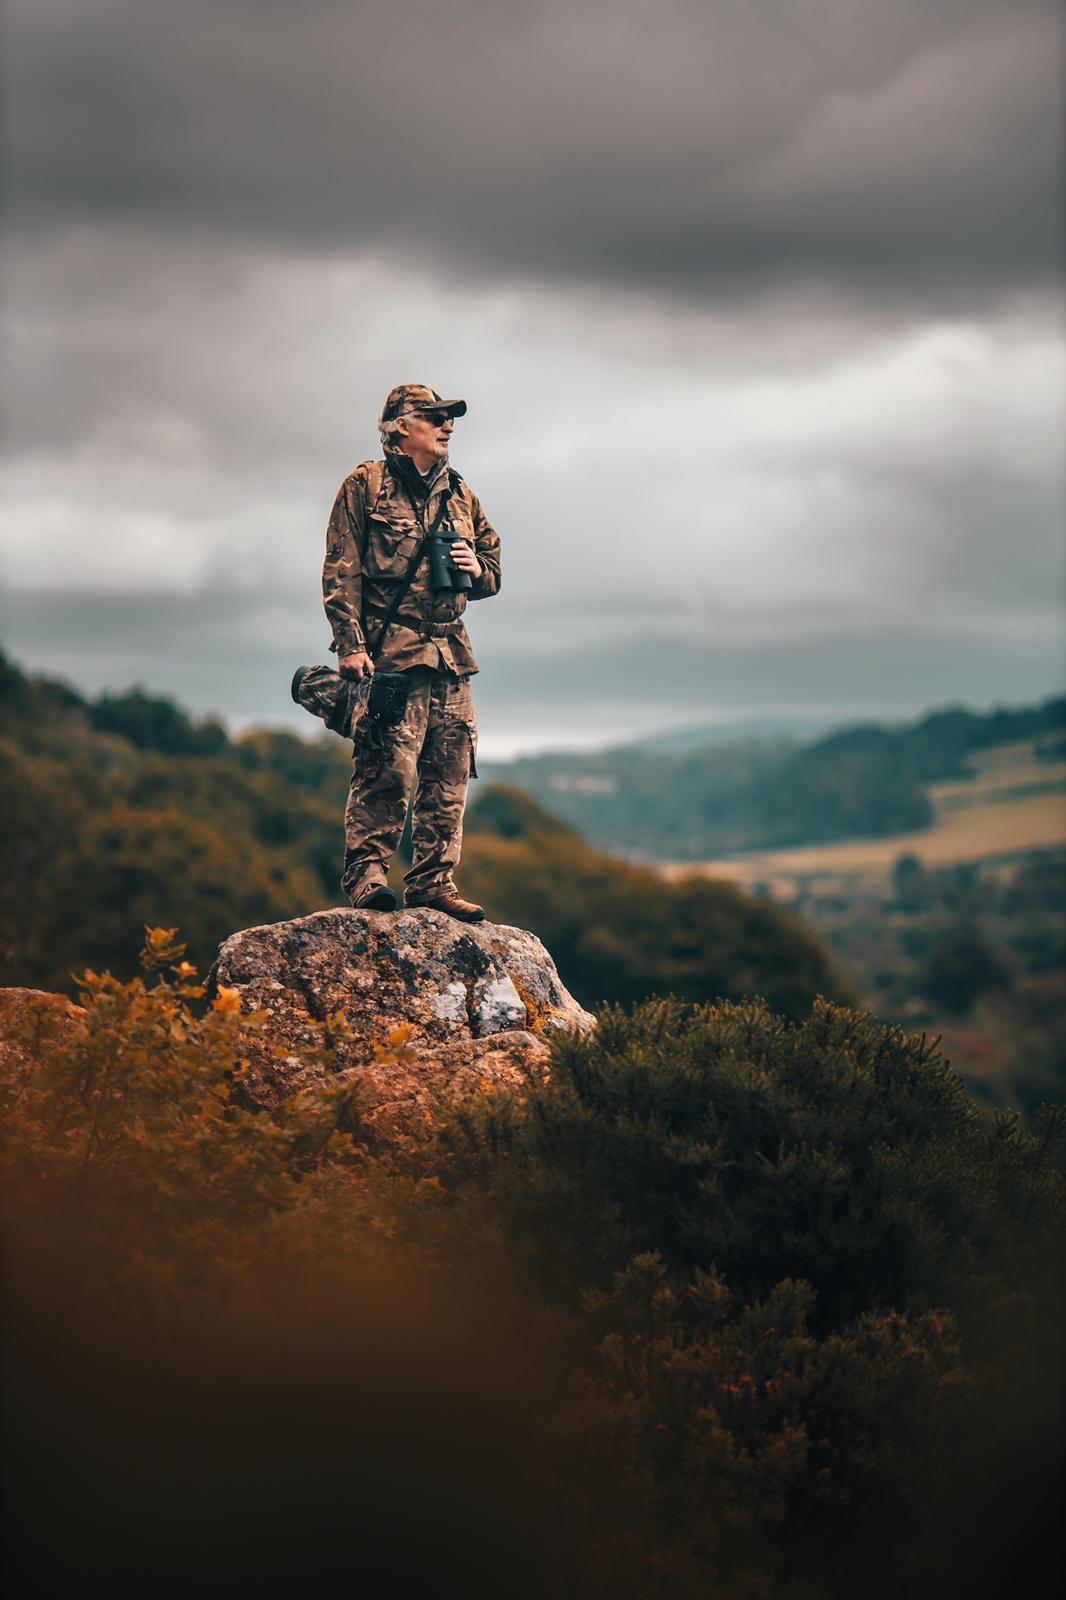 David on the Hunters Path - photograph (c) Gabriel Bailey